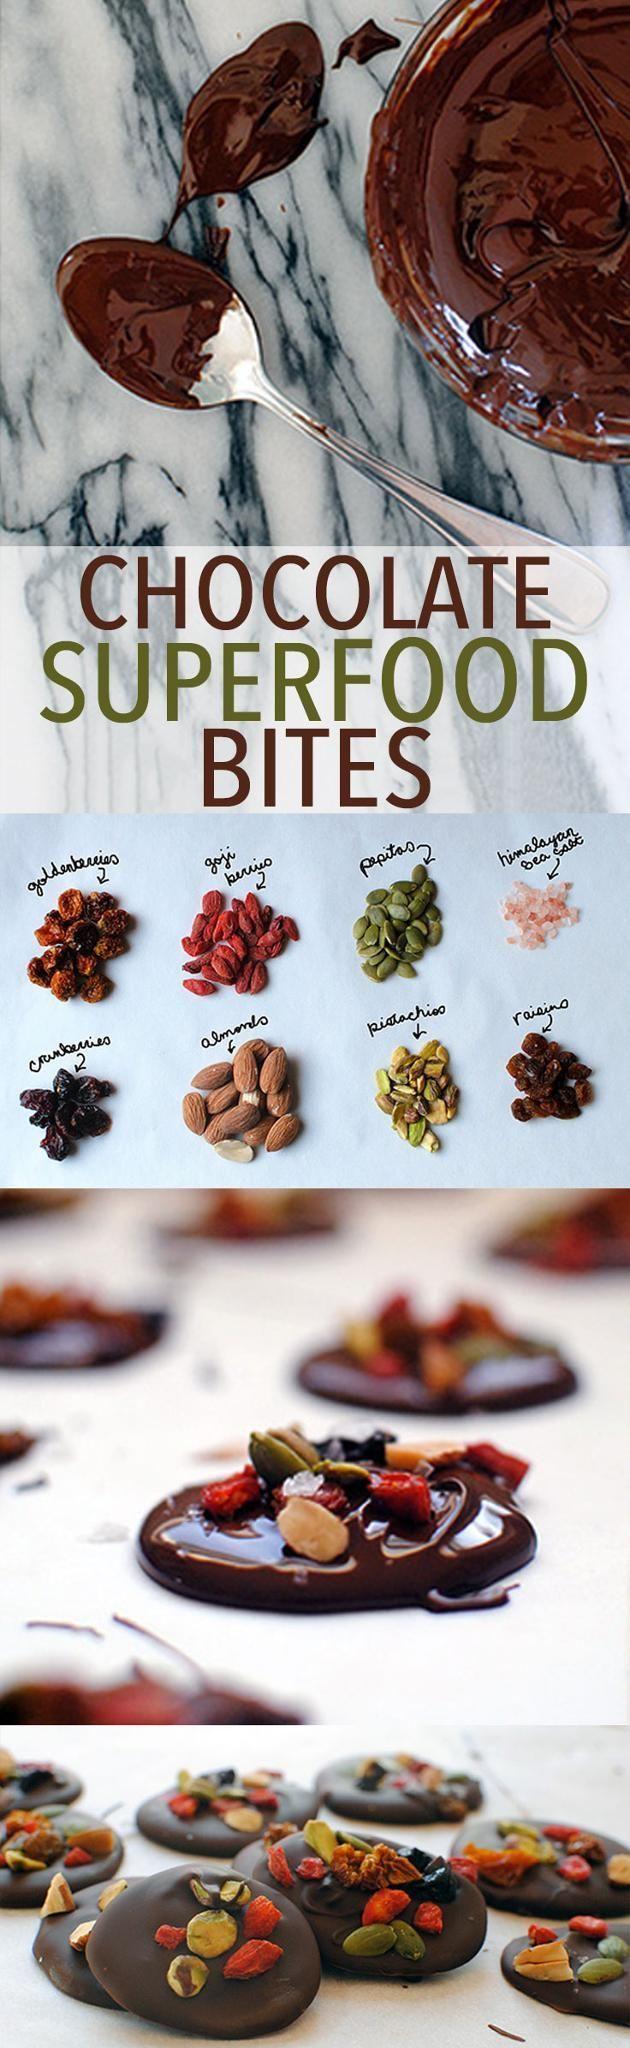 Chocolate Superfood Bites -- Sweet, super, and simple to make. // recipes // desserts // snacks // healthy // nuts // salty // almonds // pistachios // raisins // cranberries // goji berries // pumpkin seeds // goldenberries // holidays // treats // Beachbody // BeachbodyBlog.com